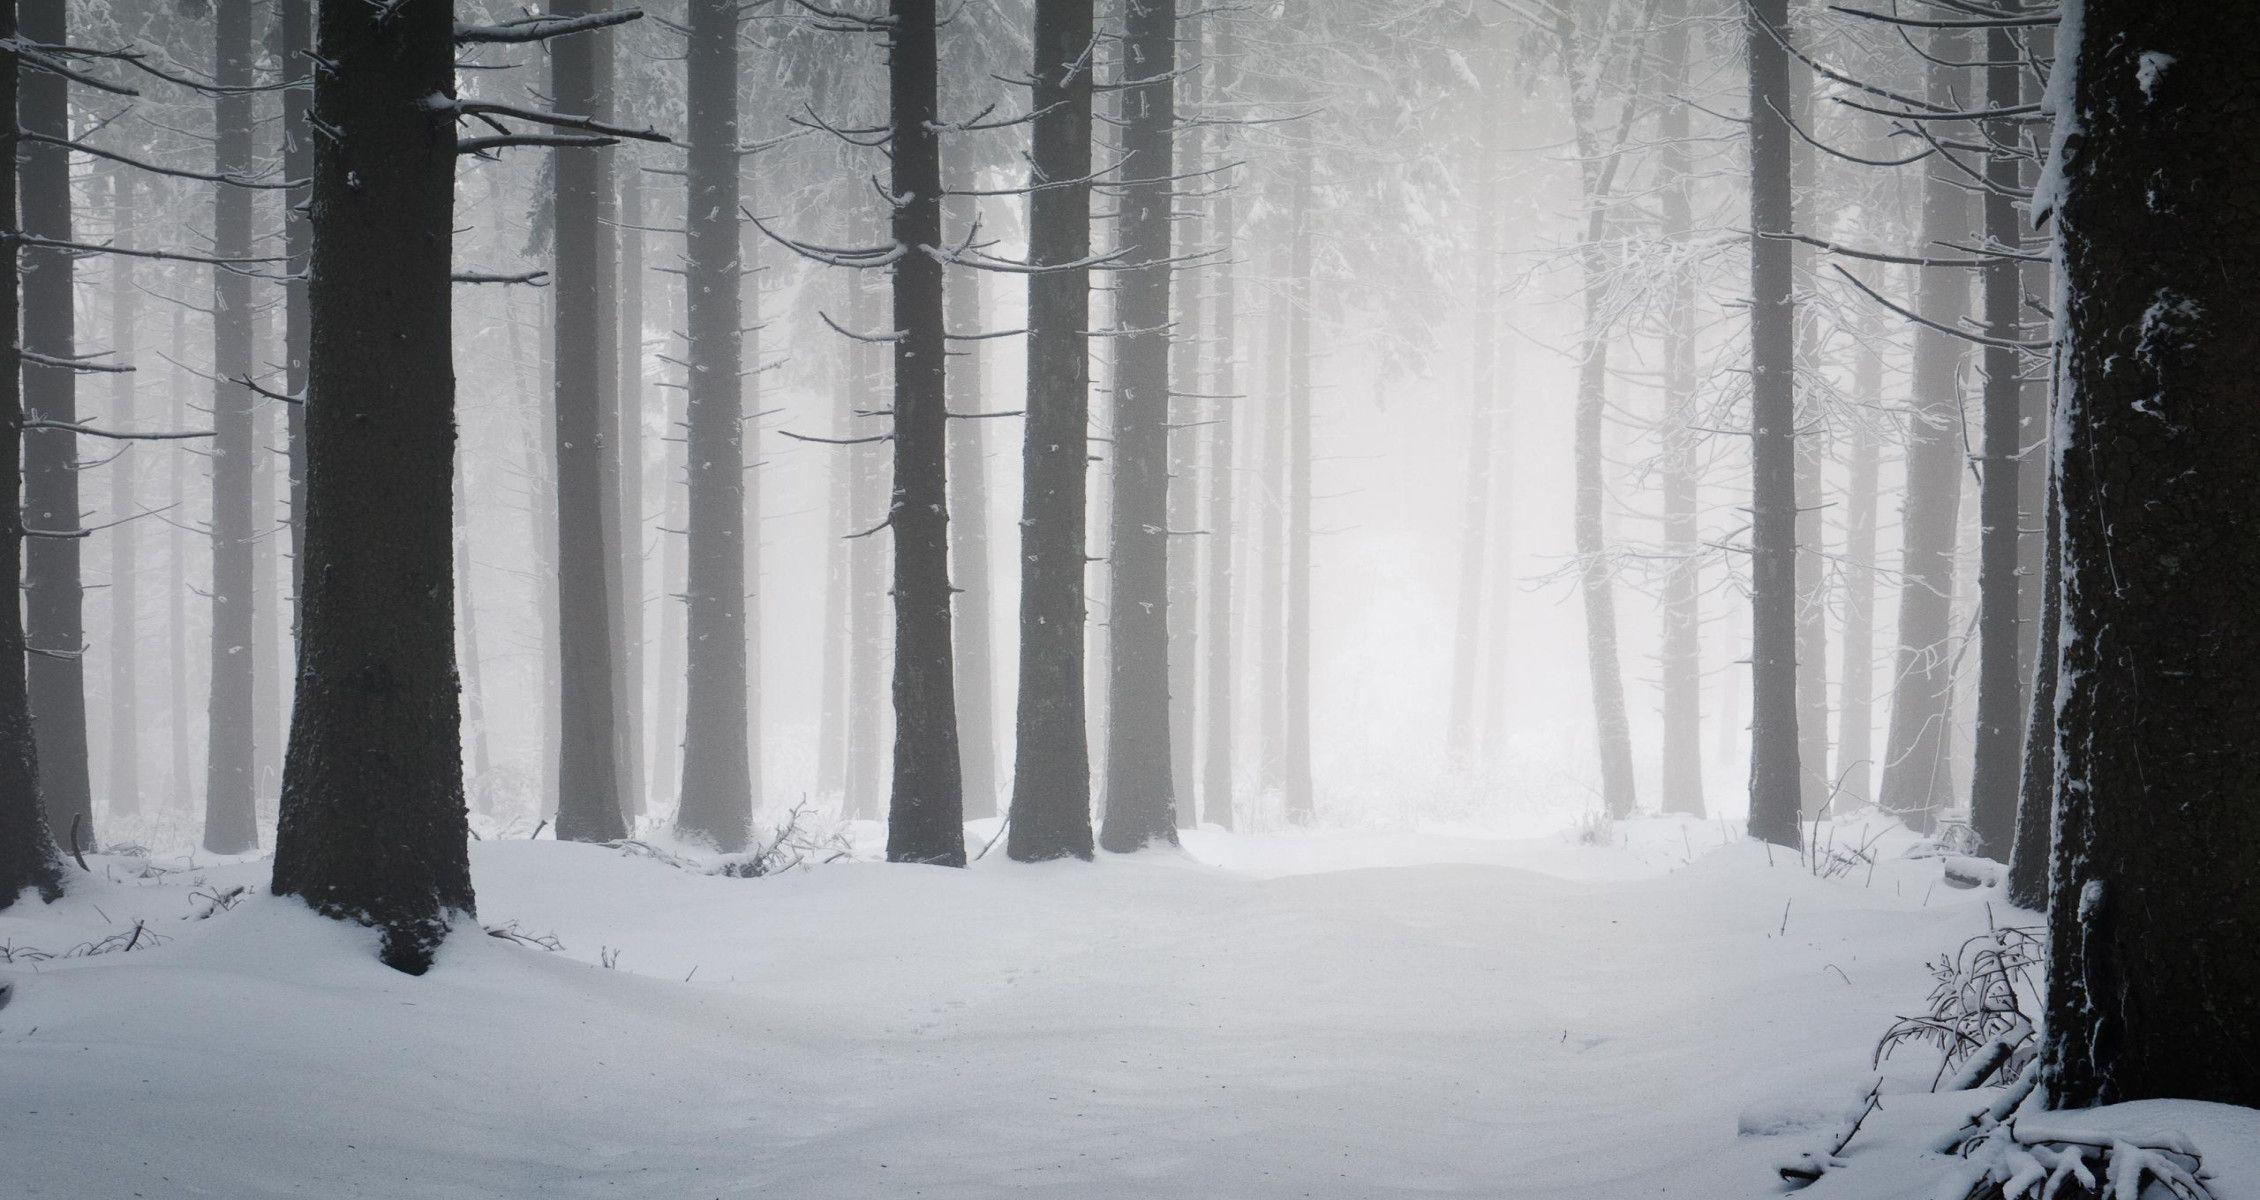 Snowy Forest High Definition Wallpaper Hd Wallpapers Snow Forest Snowy Forest Winter Forest Hd wallpaper snow winter forest trees